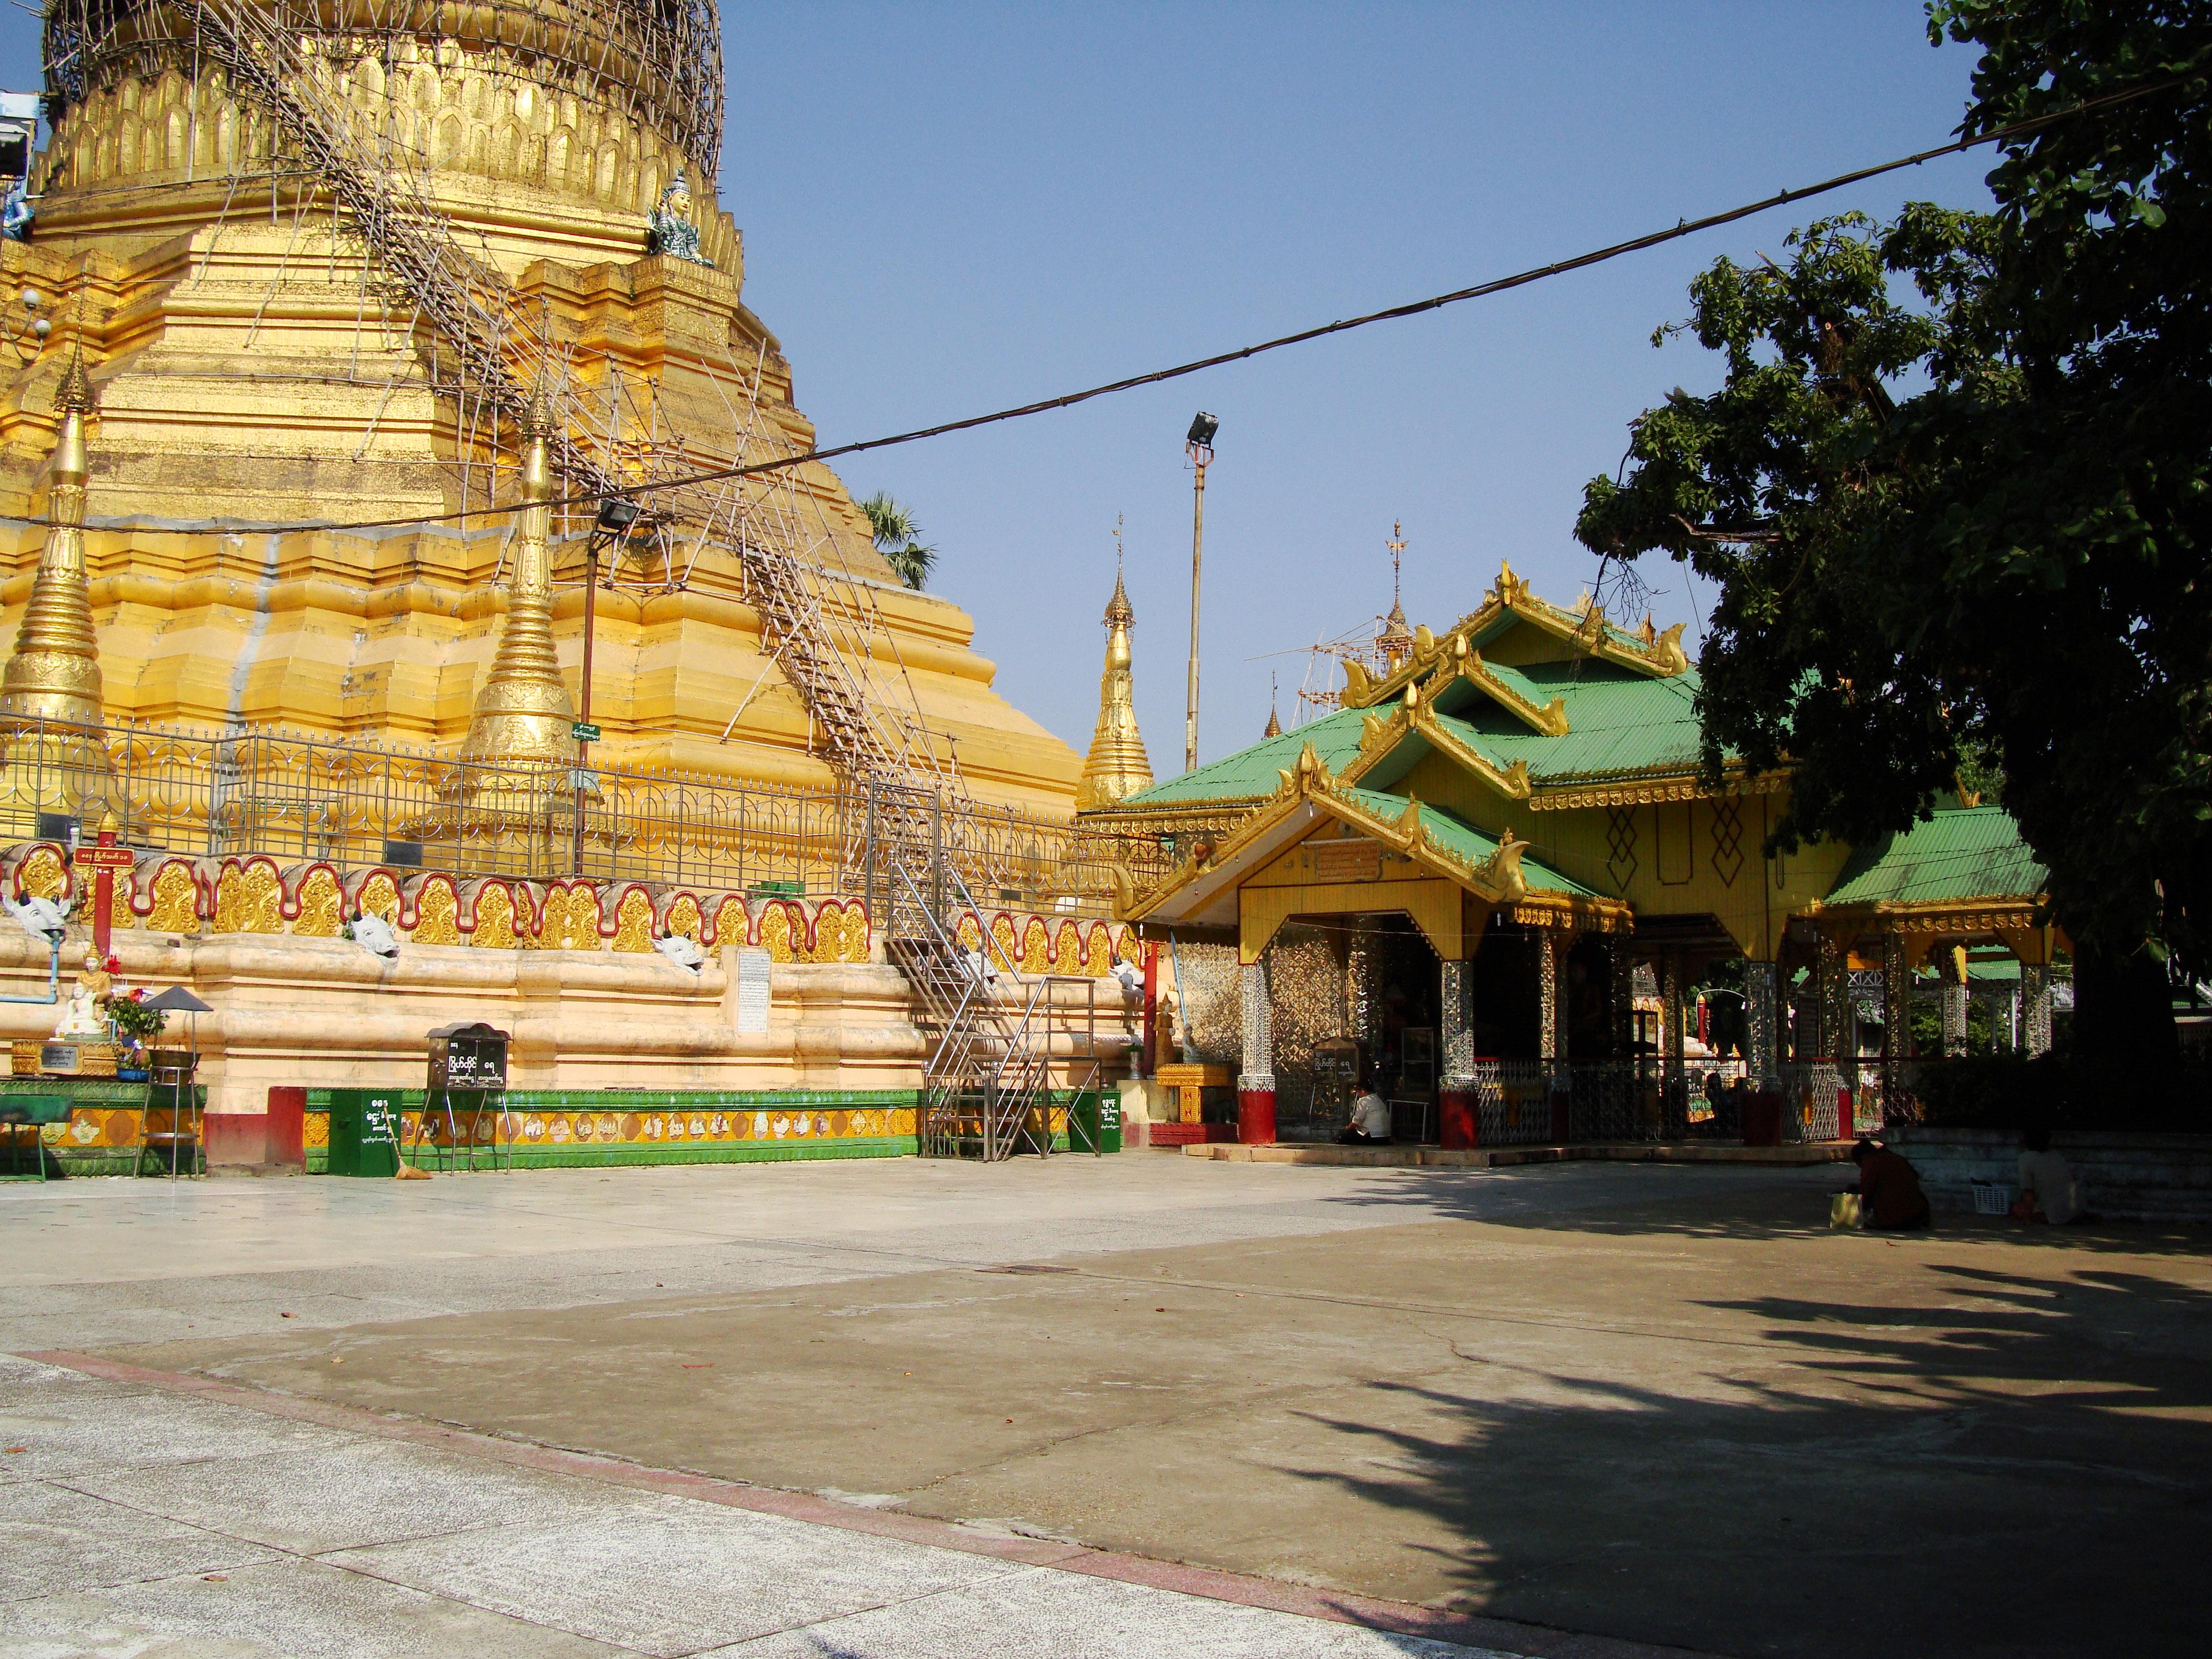 Kyaik Ka San Pagoda South Oak ka lar township Yangon Dec 2009 25